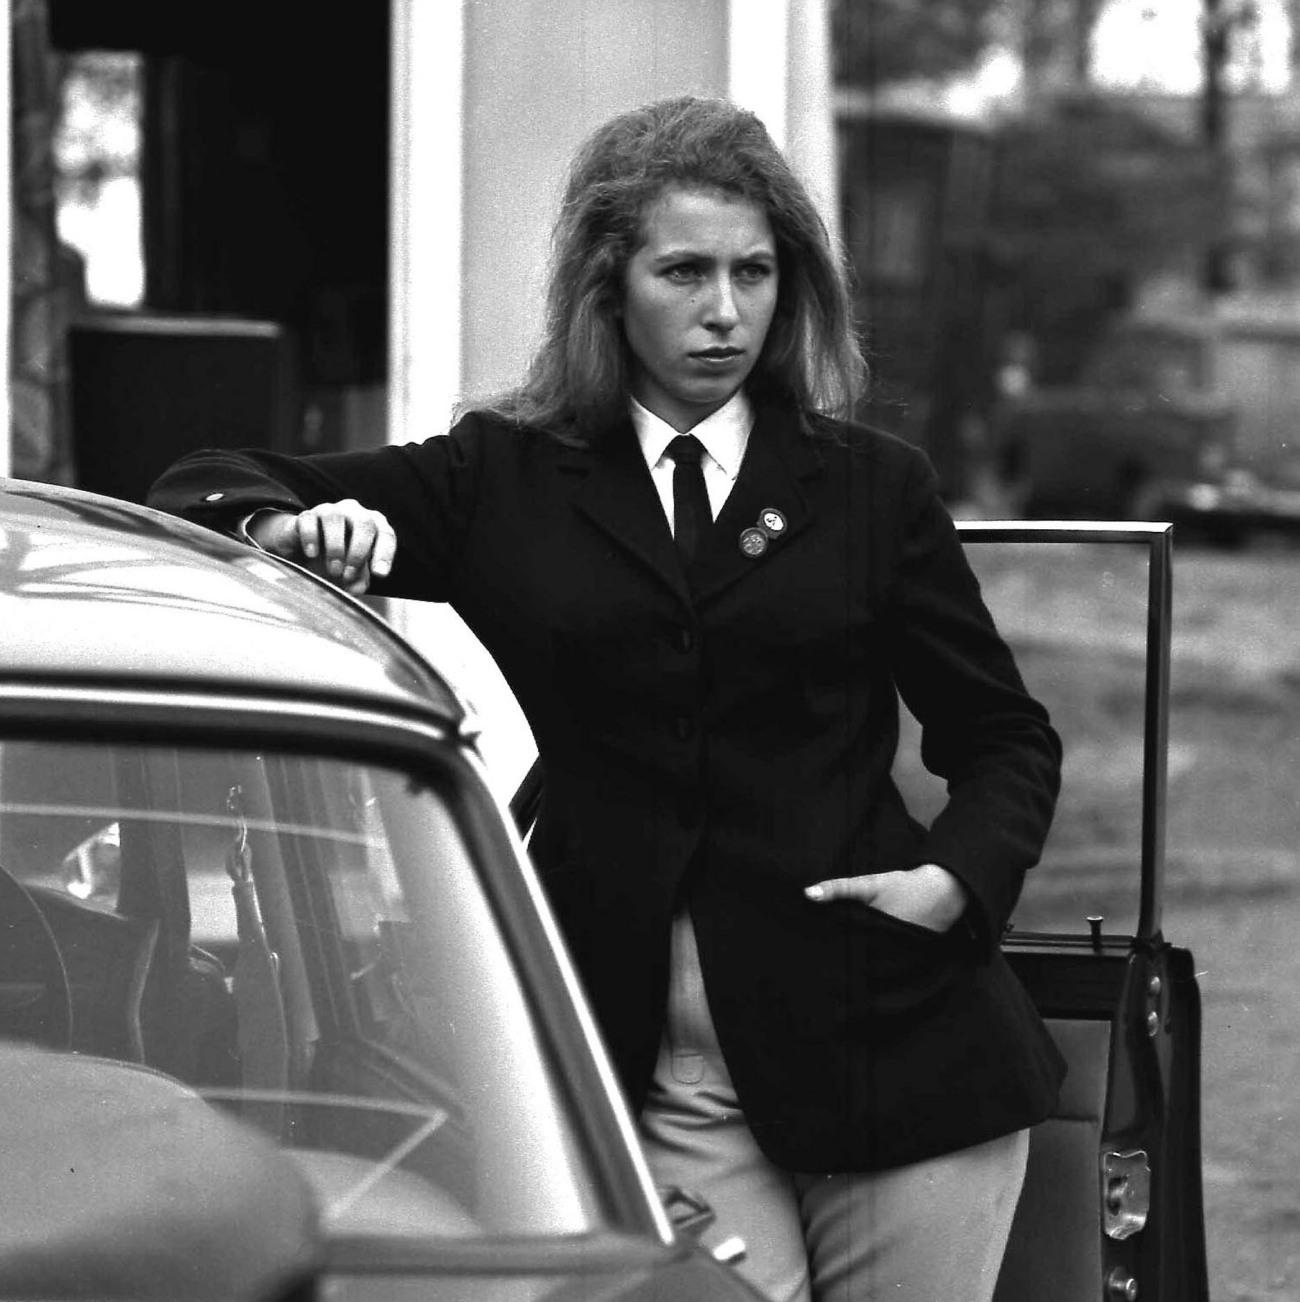 HRH THE PRINCESS ROYAL (HRH Princess Anne) CREDITO OBBLIGATORIO: UPPA / Photoshot PhotoPAH 185811 09.10.1969